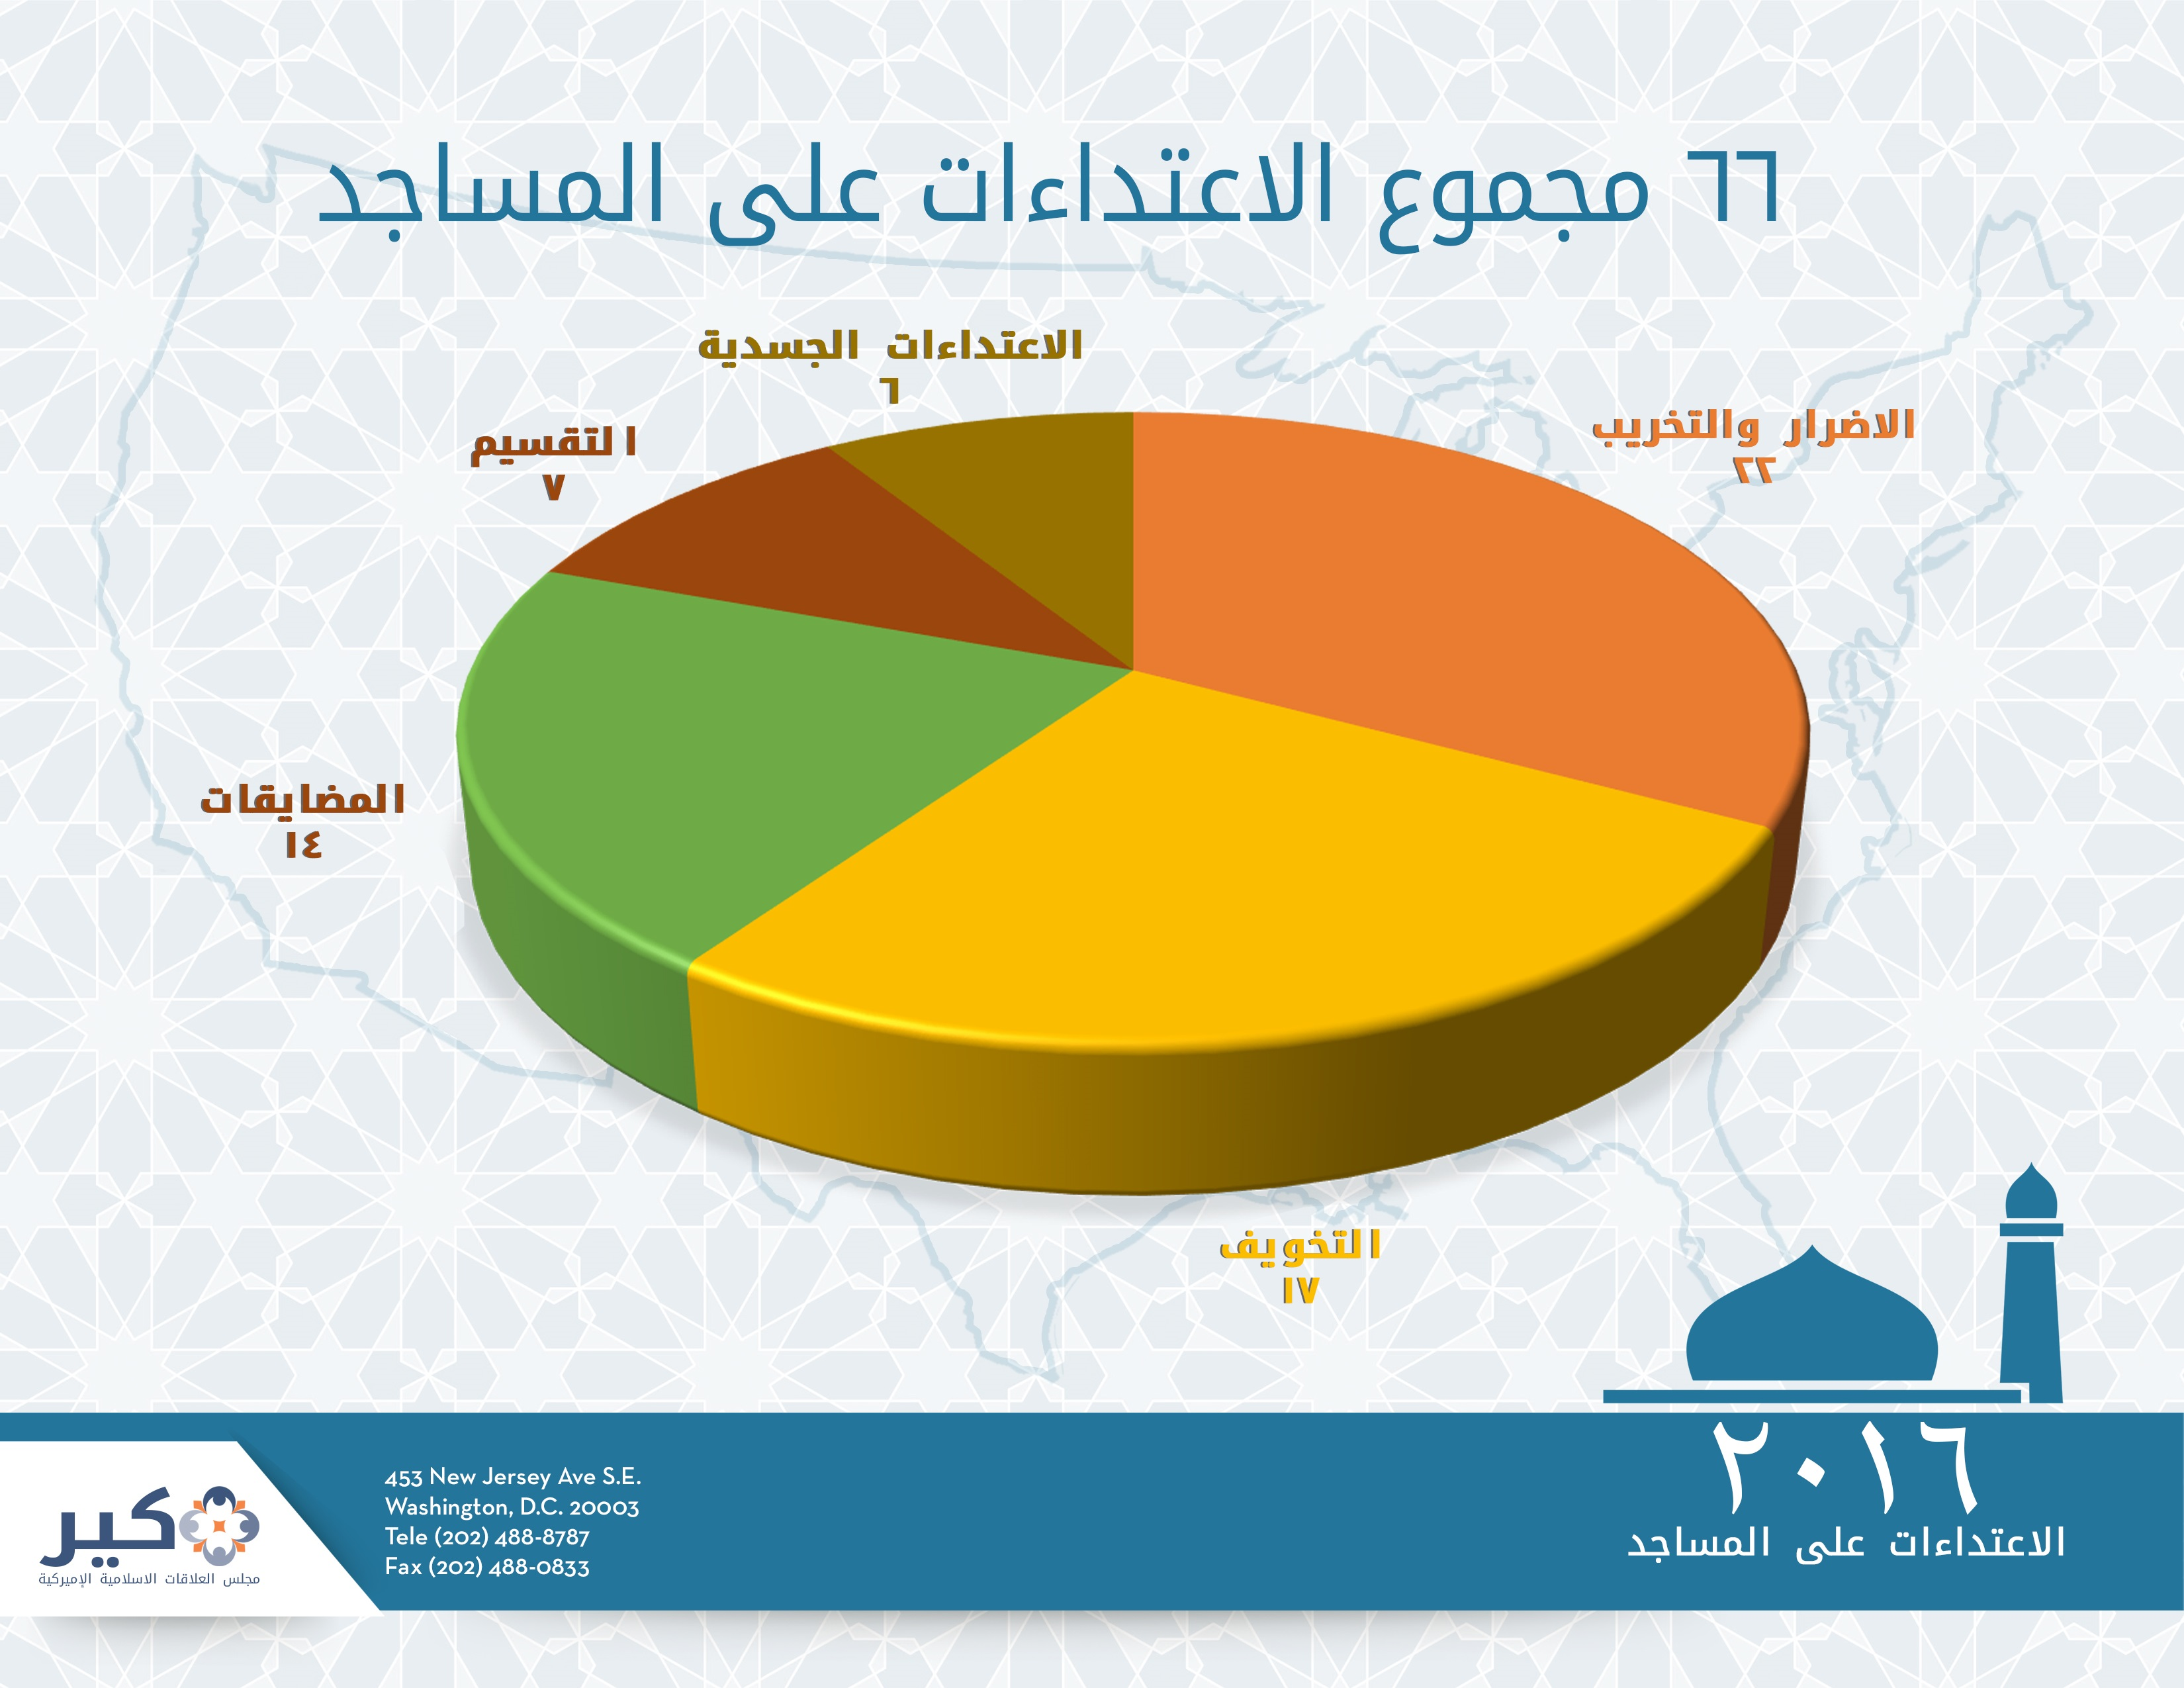 2mosque-charts-arabic-2222